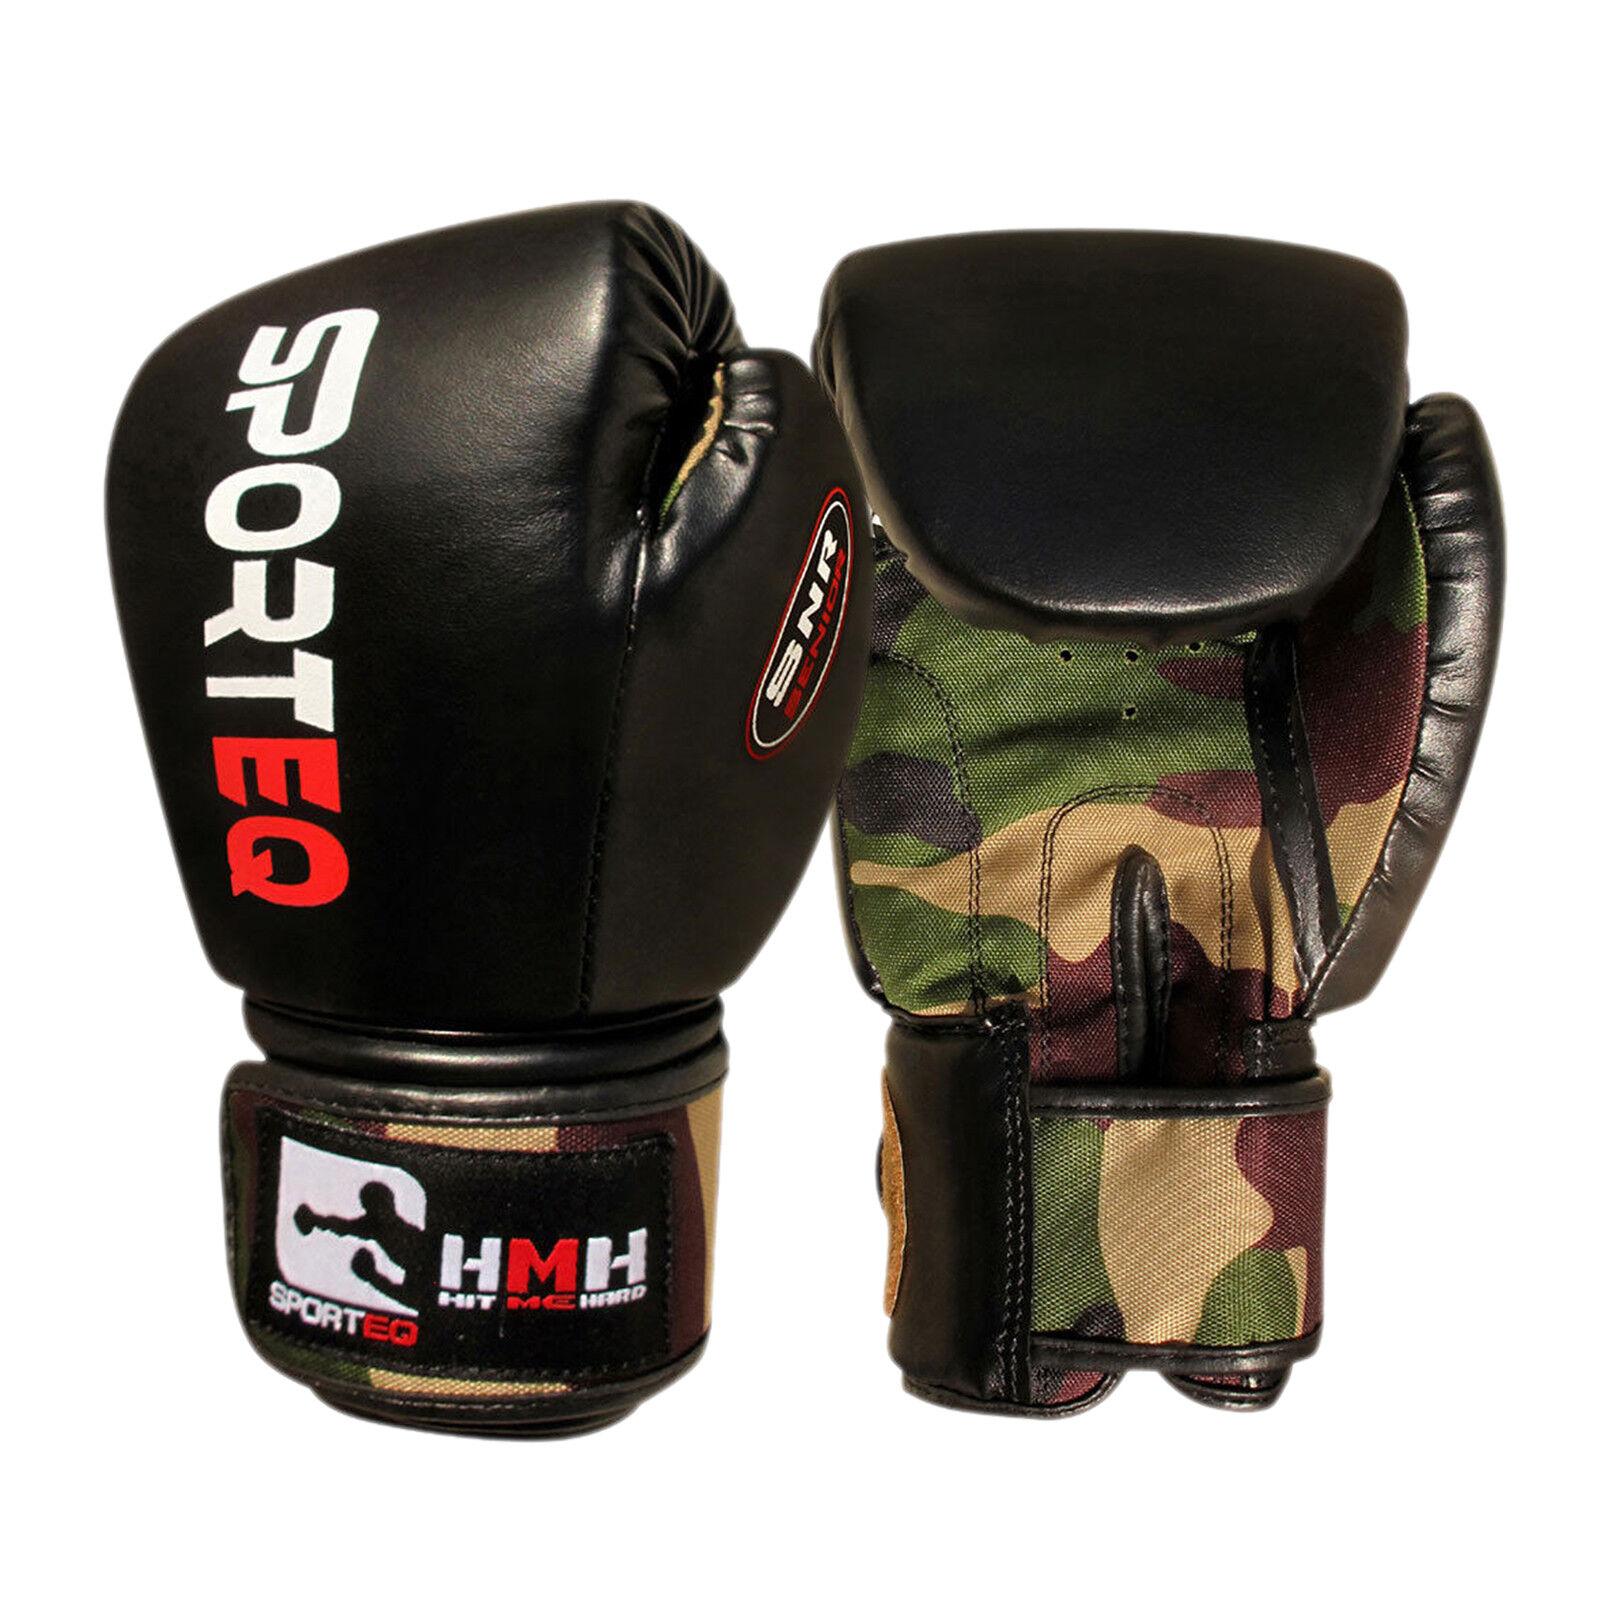 Sporteq Boxen Schlagen Handschuhe Armee Rex-Leder Kampfsport Kampftraining